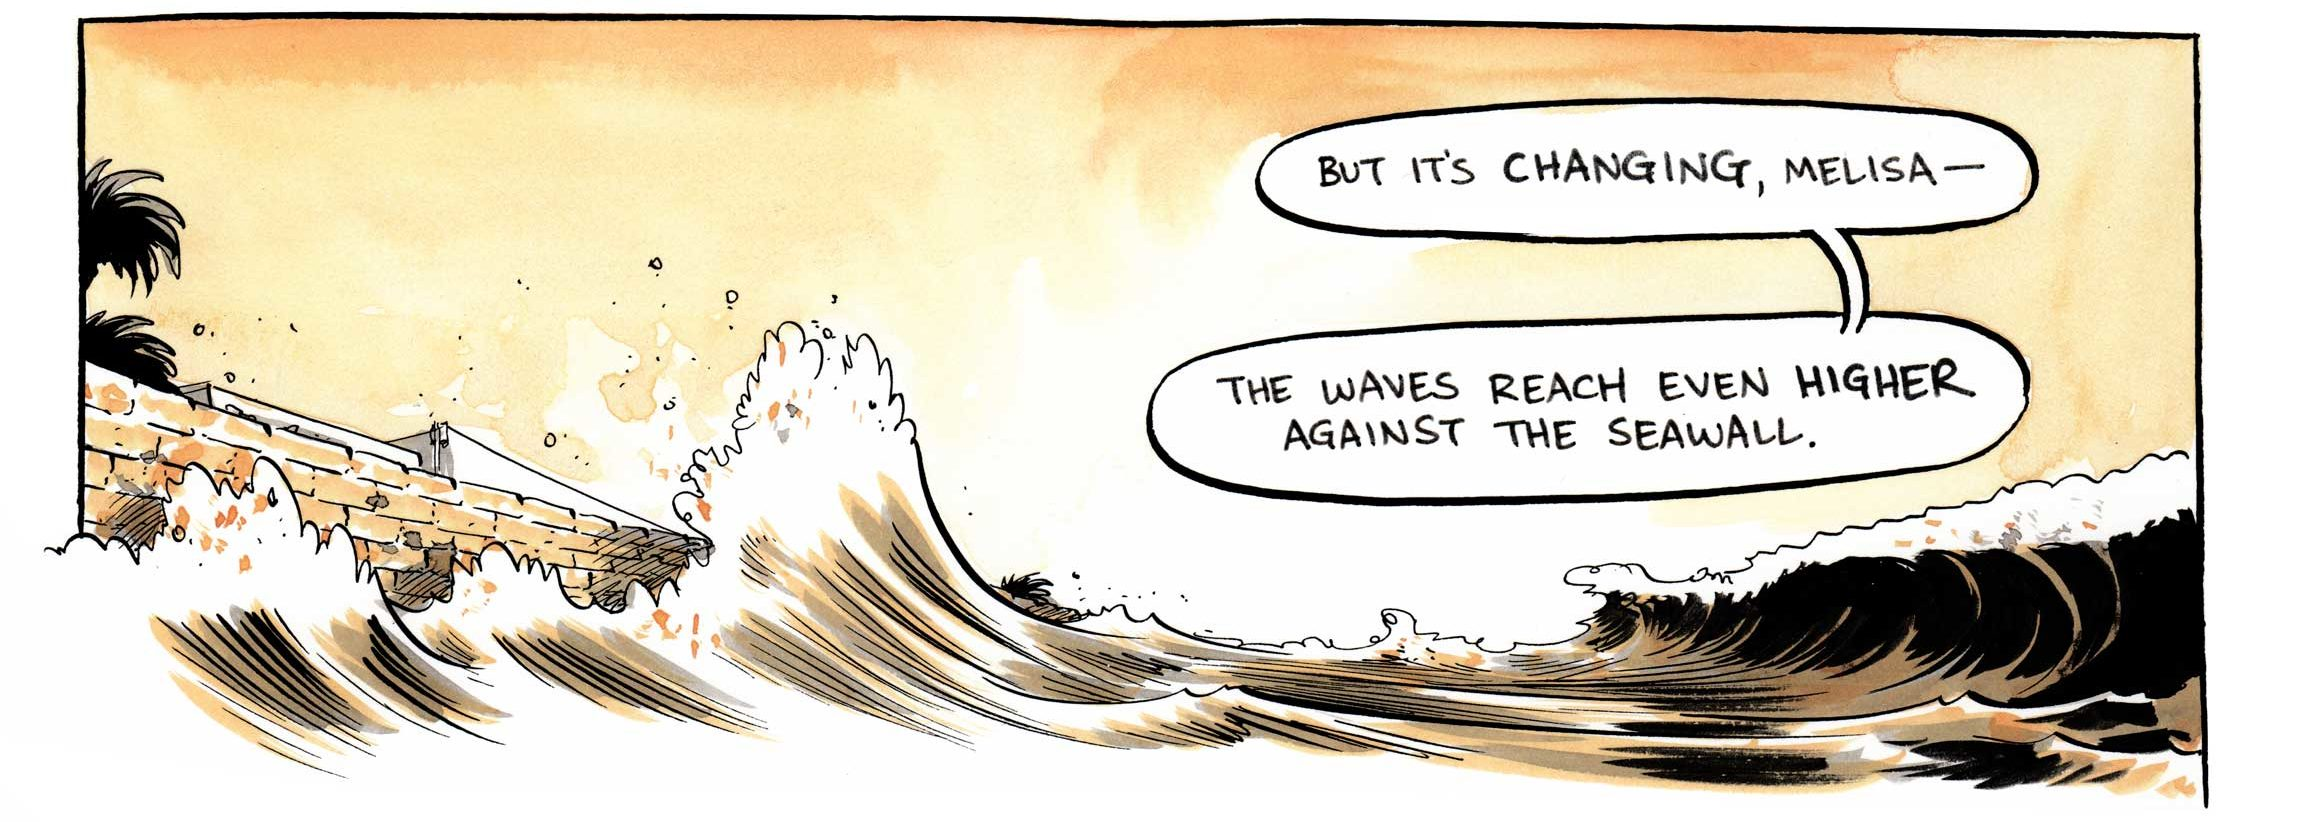 Awaiting A Wave